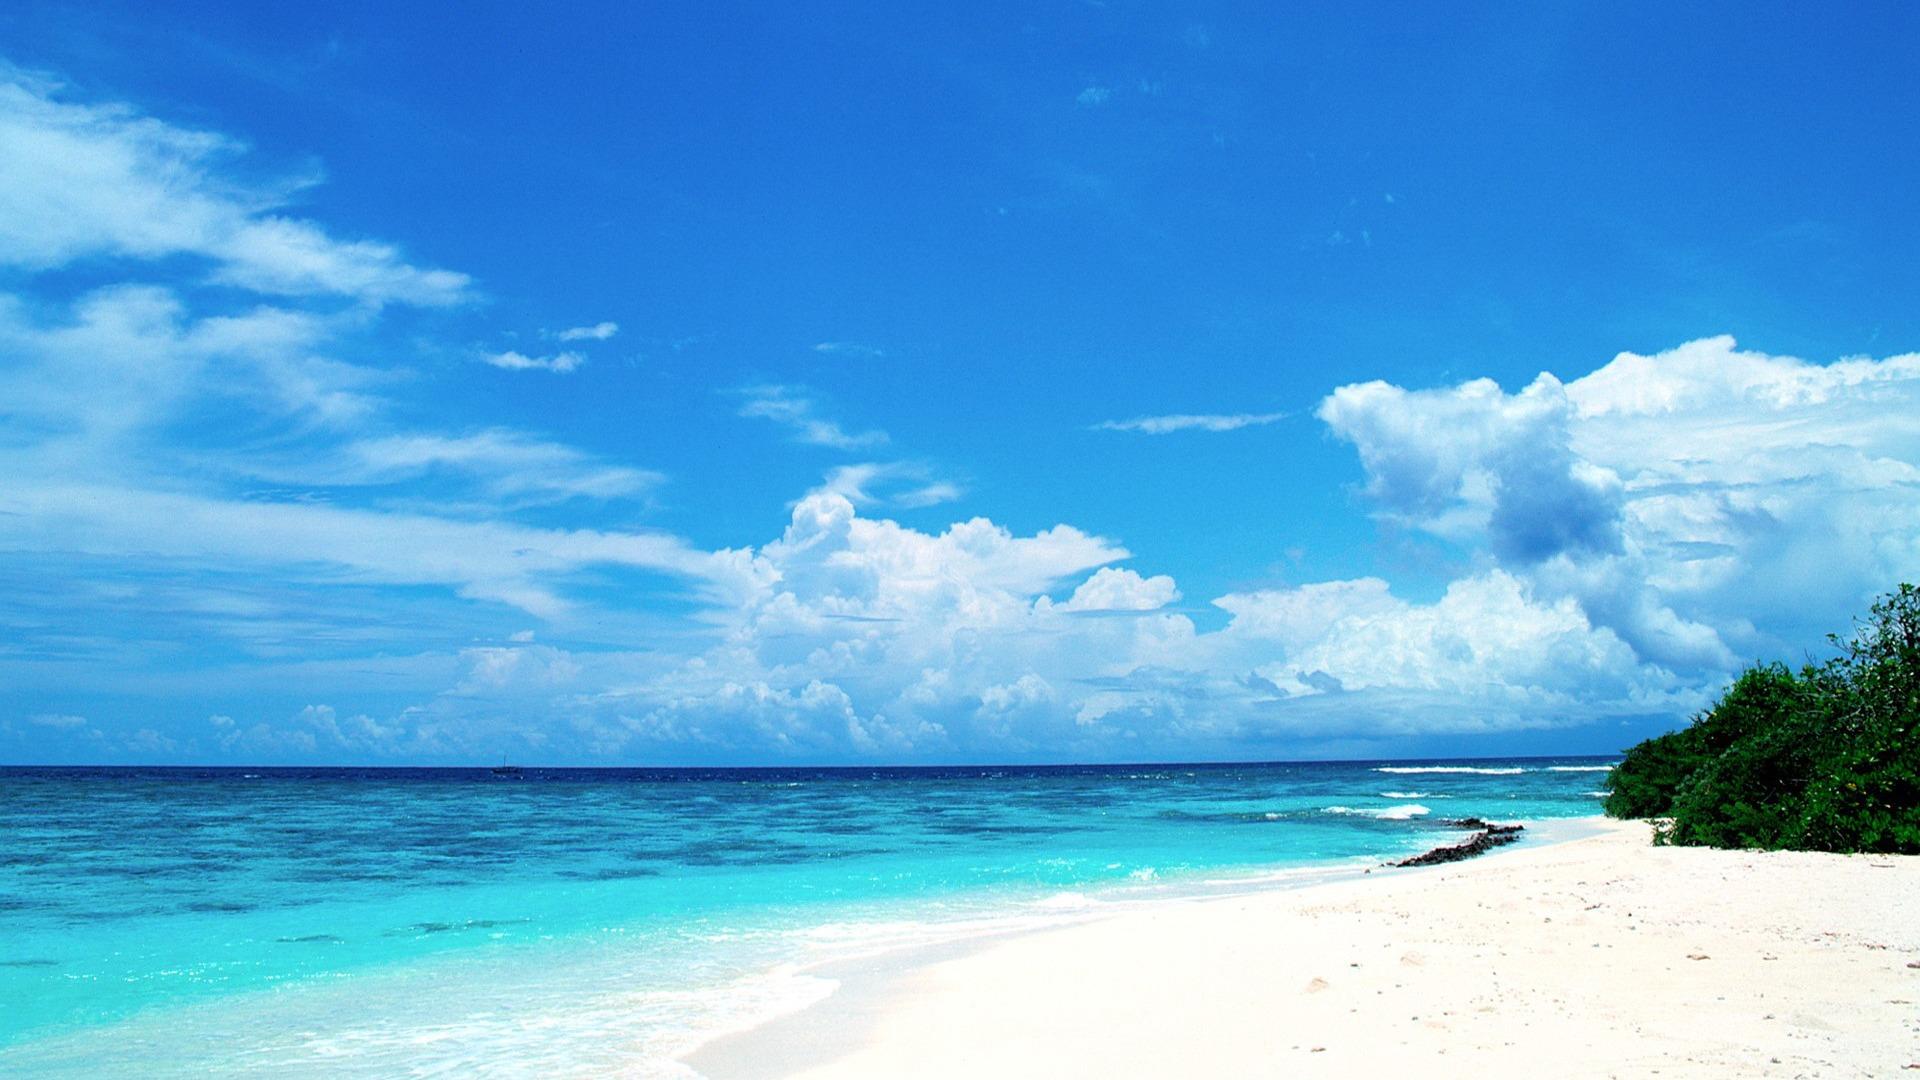 Free Download Maldives Beach Summer Wallpaper 19x1080 Wallpaper Download 19x1080 For Your Desktop Mobile Tablet Explore 37 19 X 1080 Summer Wallpaper Summer Wallpaper 1080p Summer Hd Wallpaper 19x1080 Summer Wallpapers 19x1080